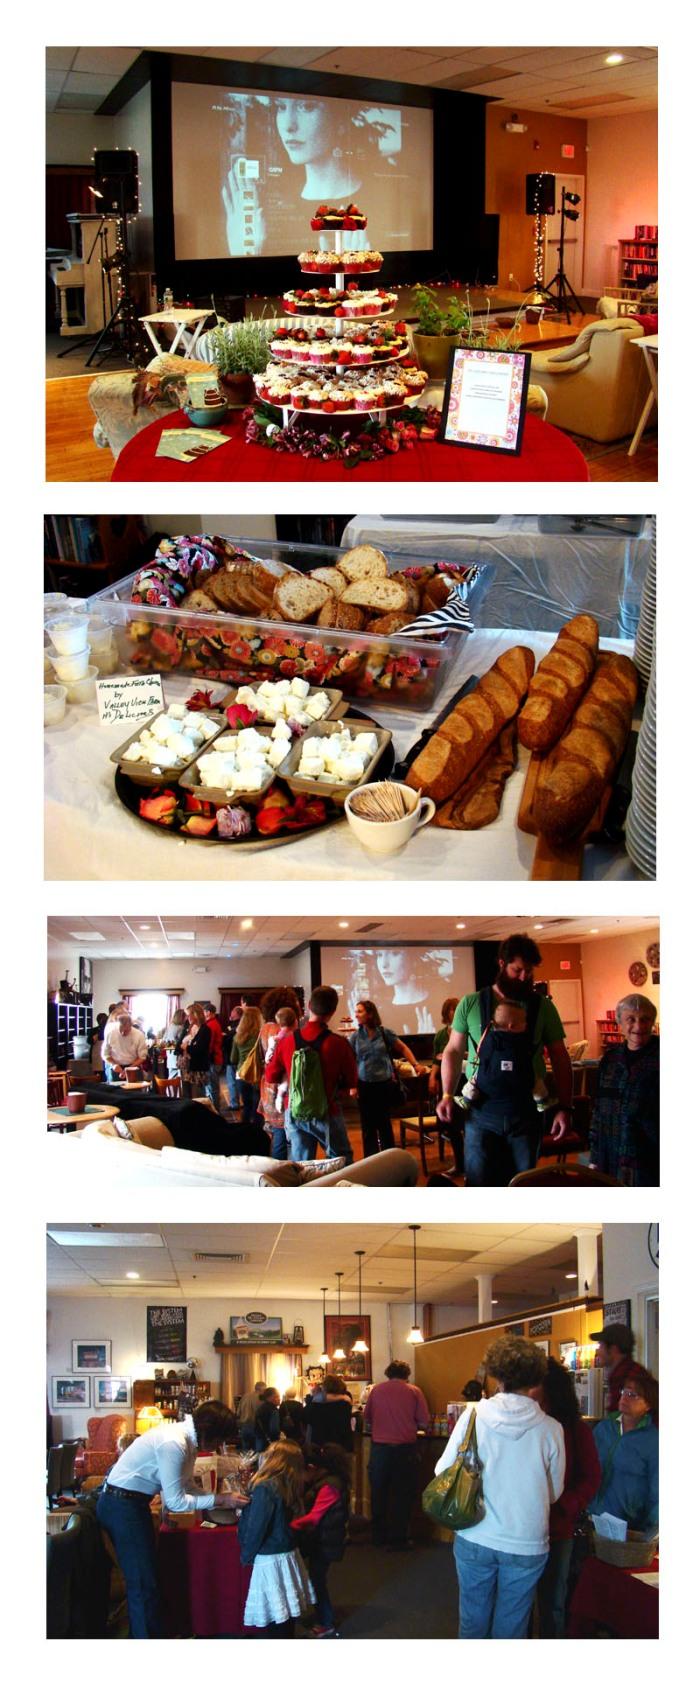 photos from cape ann farmers market fundraiser at cape ann community cinema